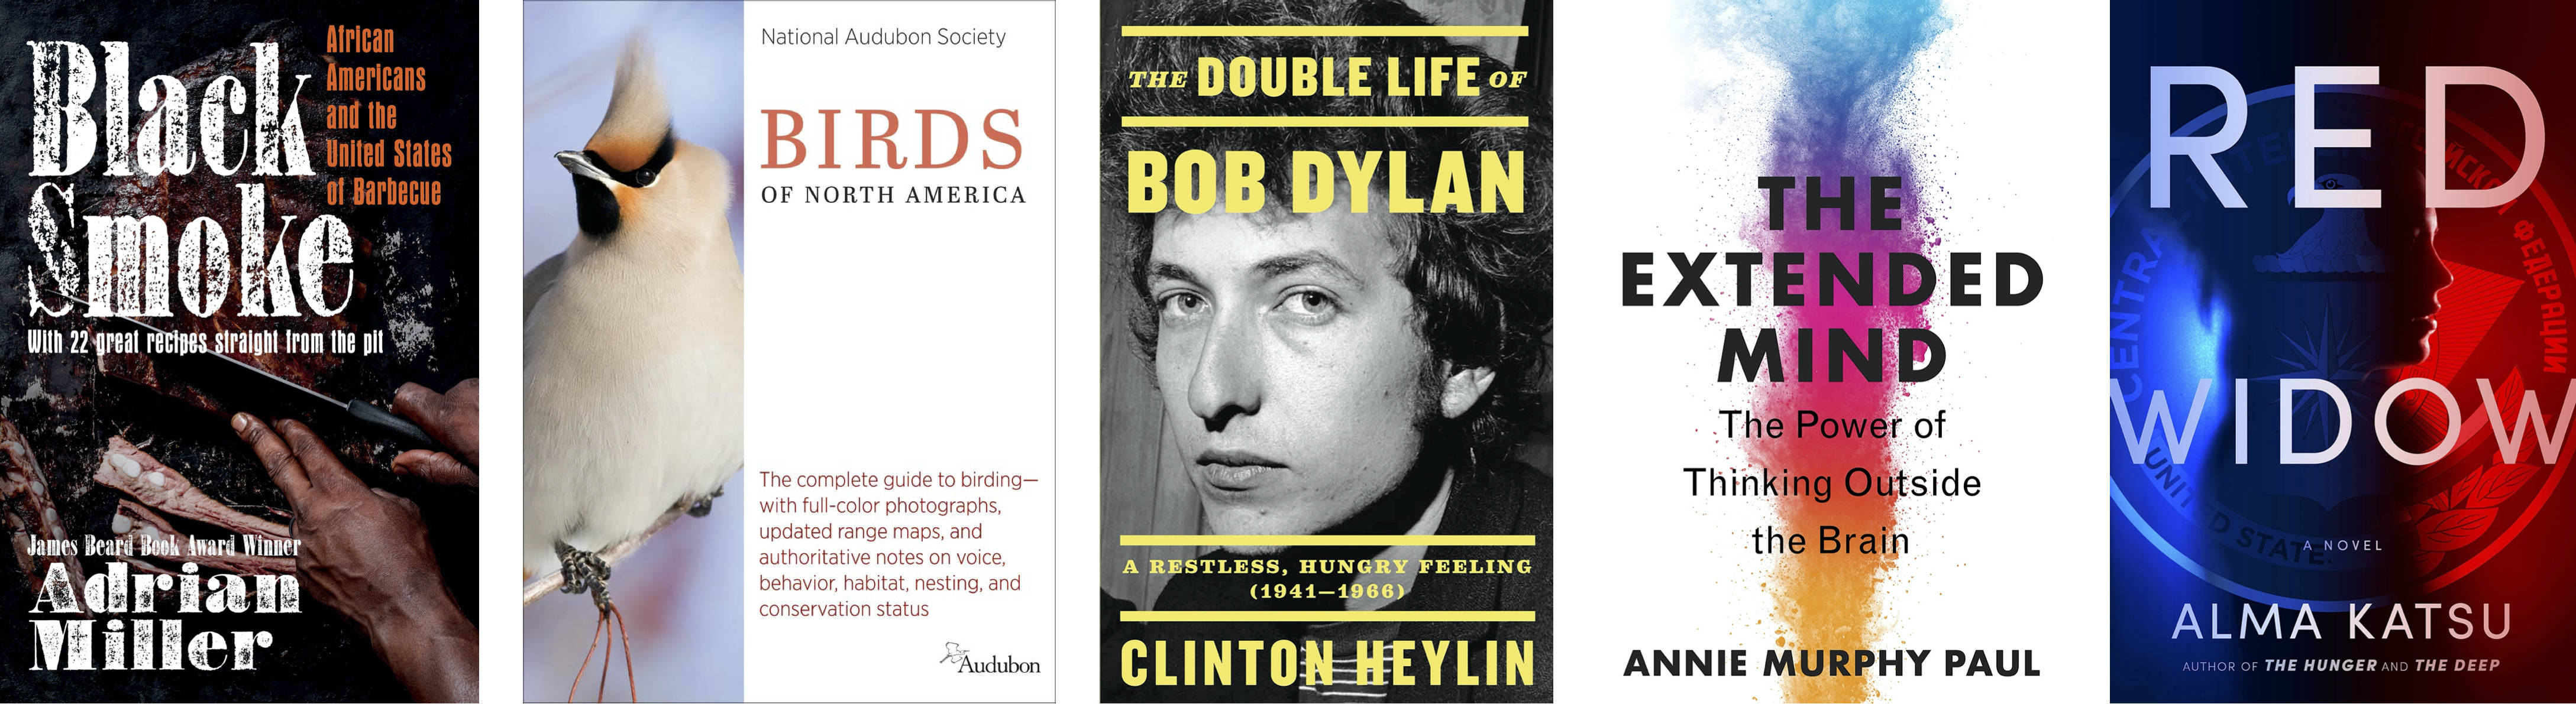 University of North Carolina Press; Knopf; Little, Brown; Houghton Mifflin Harcourt; G.P. Putnam's Sons